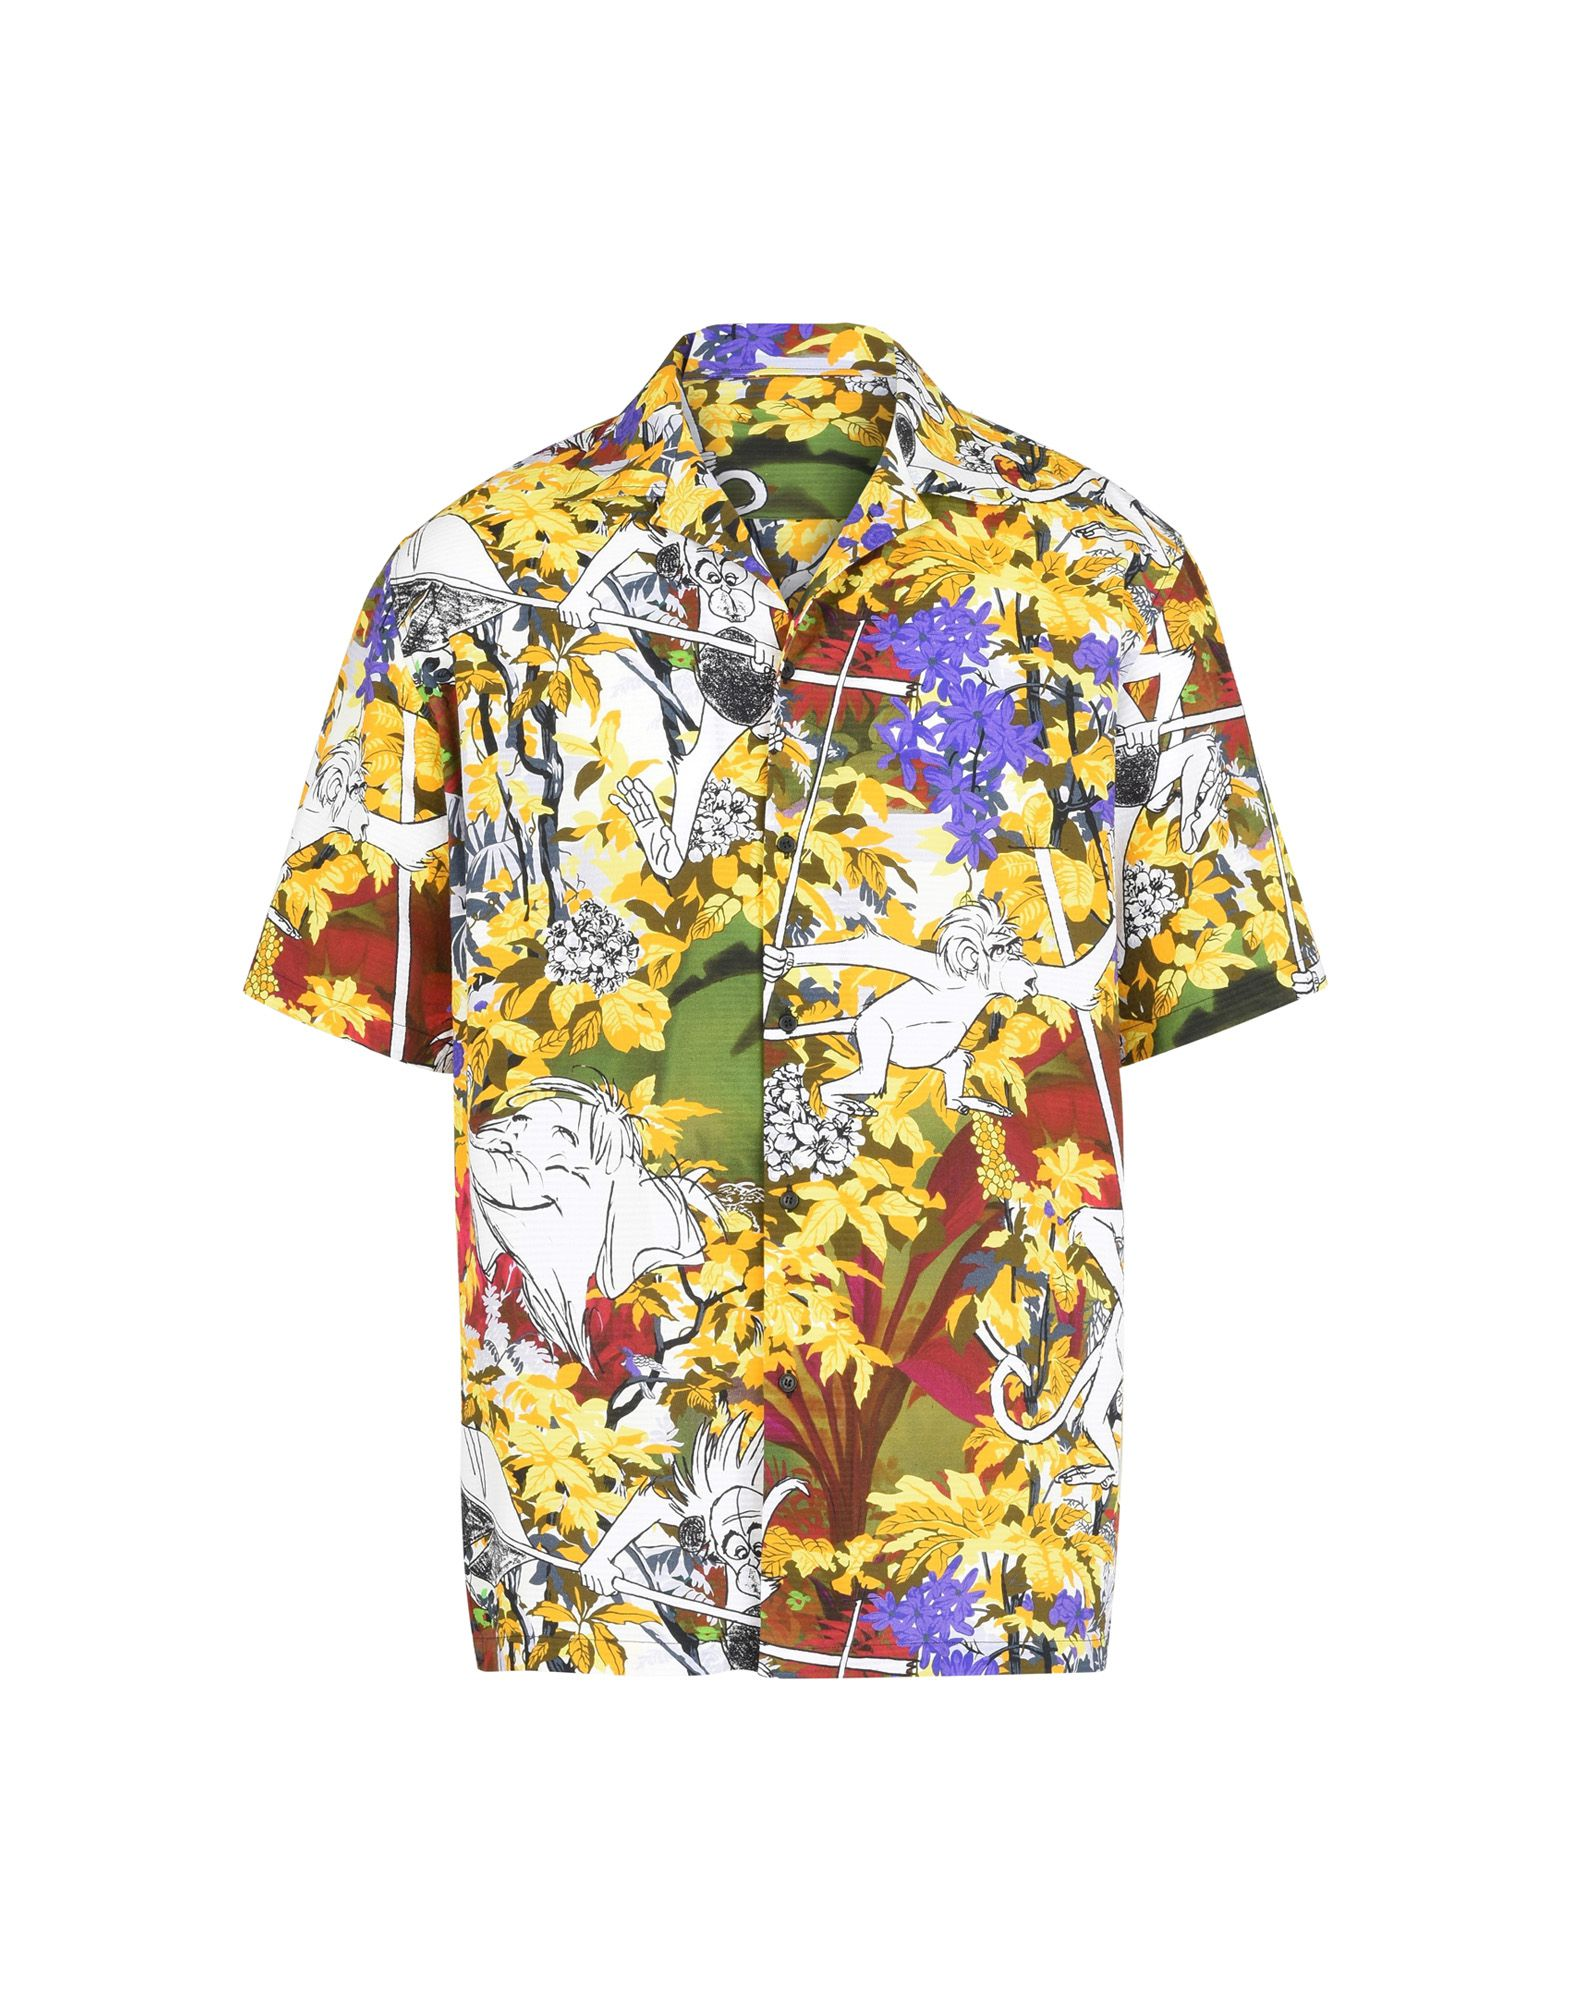 'Kenzo X Disney Shirts